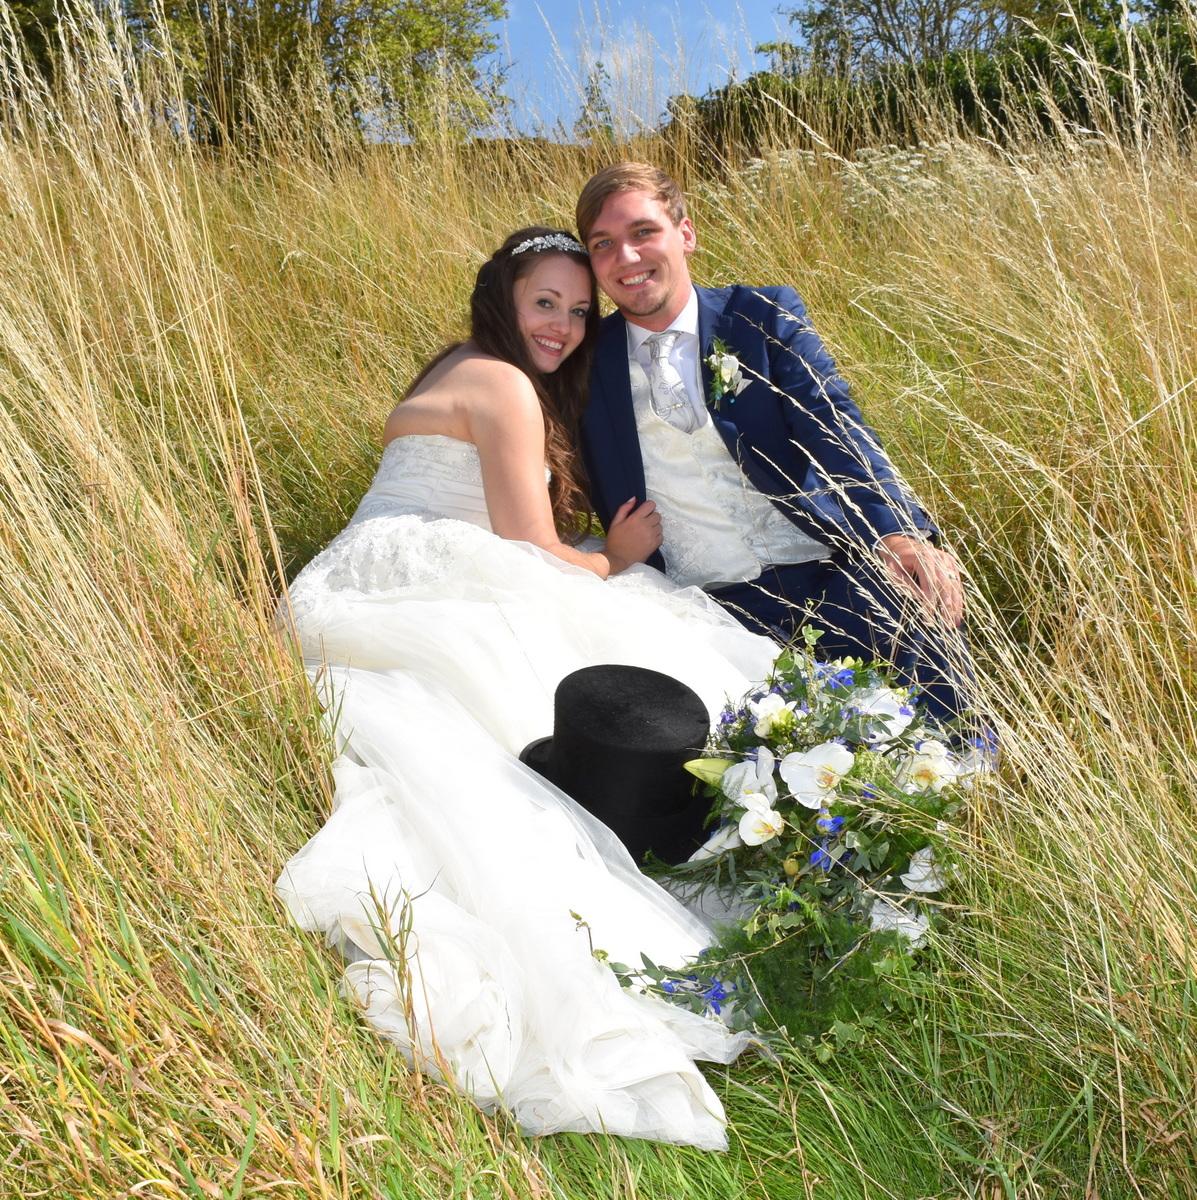 Hampshire Wedding Photography - 2015 highlights 004